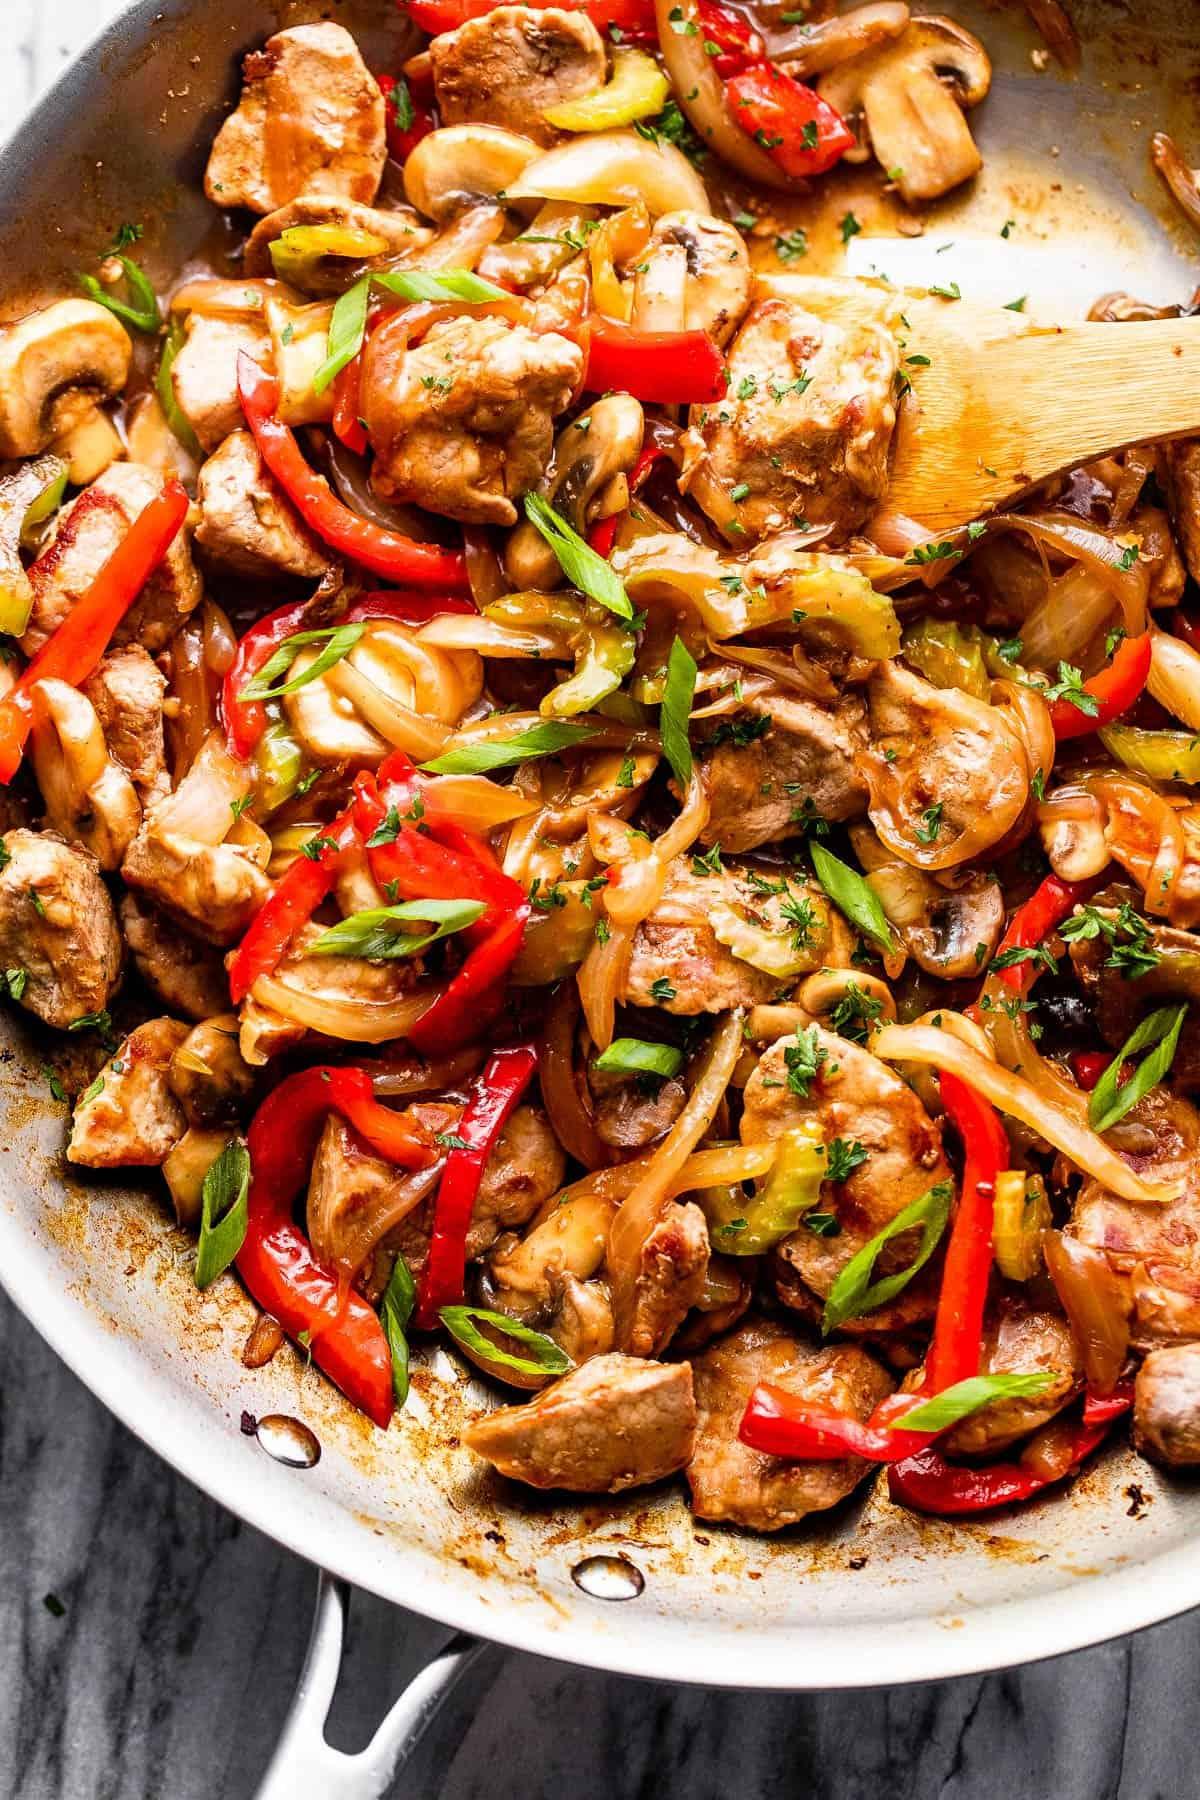 cooking pork chop stir fry in stainless skillet